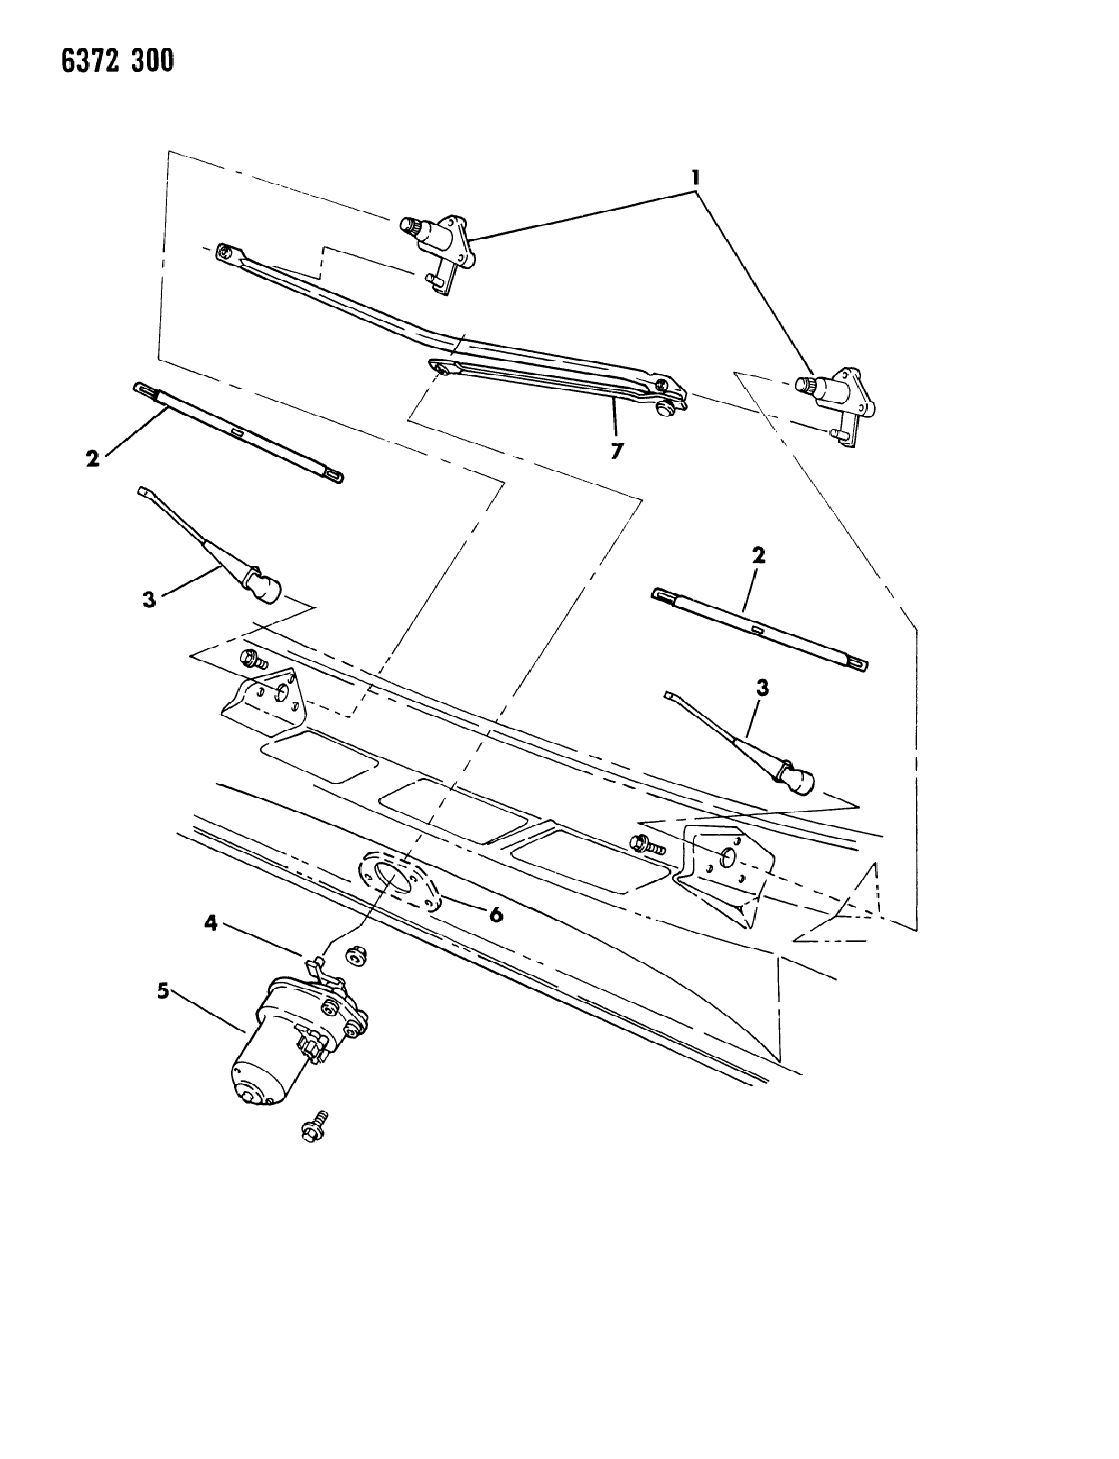 1987 Dodge Ramcharger Windshield Wiper System - Mopar Parts ... on cyclone wiring diagram, malibu wiring diagram, challenger wiring diagram, regal wiring diagram, caravan wiring diagram, allante wiring diagram, w200 wiring diagram, thunderbolt wiring diagram, charger wiring diagram, d150 wiring diagram, explorer wiring diagram, chrysler wiring diagram, van wiring diagram, vip wiring diagram, ram wiring diagram, viper wiring diagram, tracker wiring diagram, suburban wiring diagram, pickup wiring diagram, dakota wiring diagram,